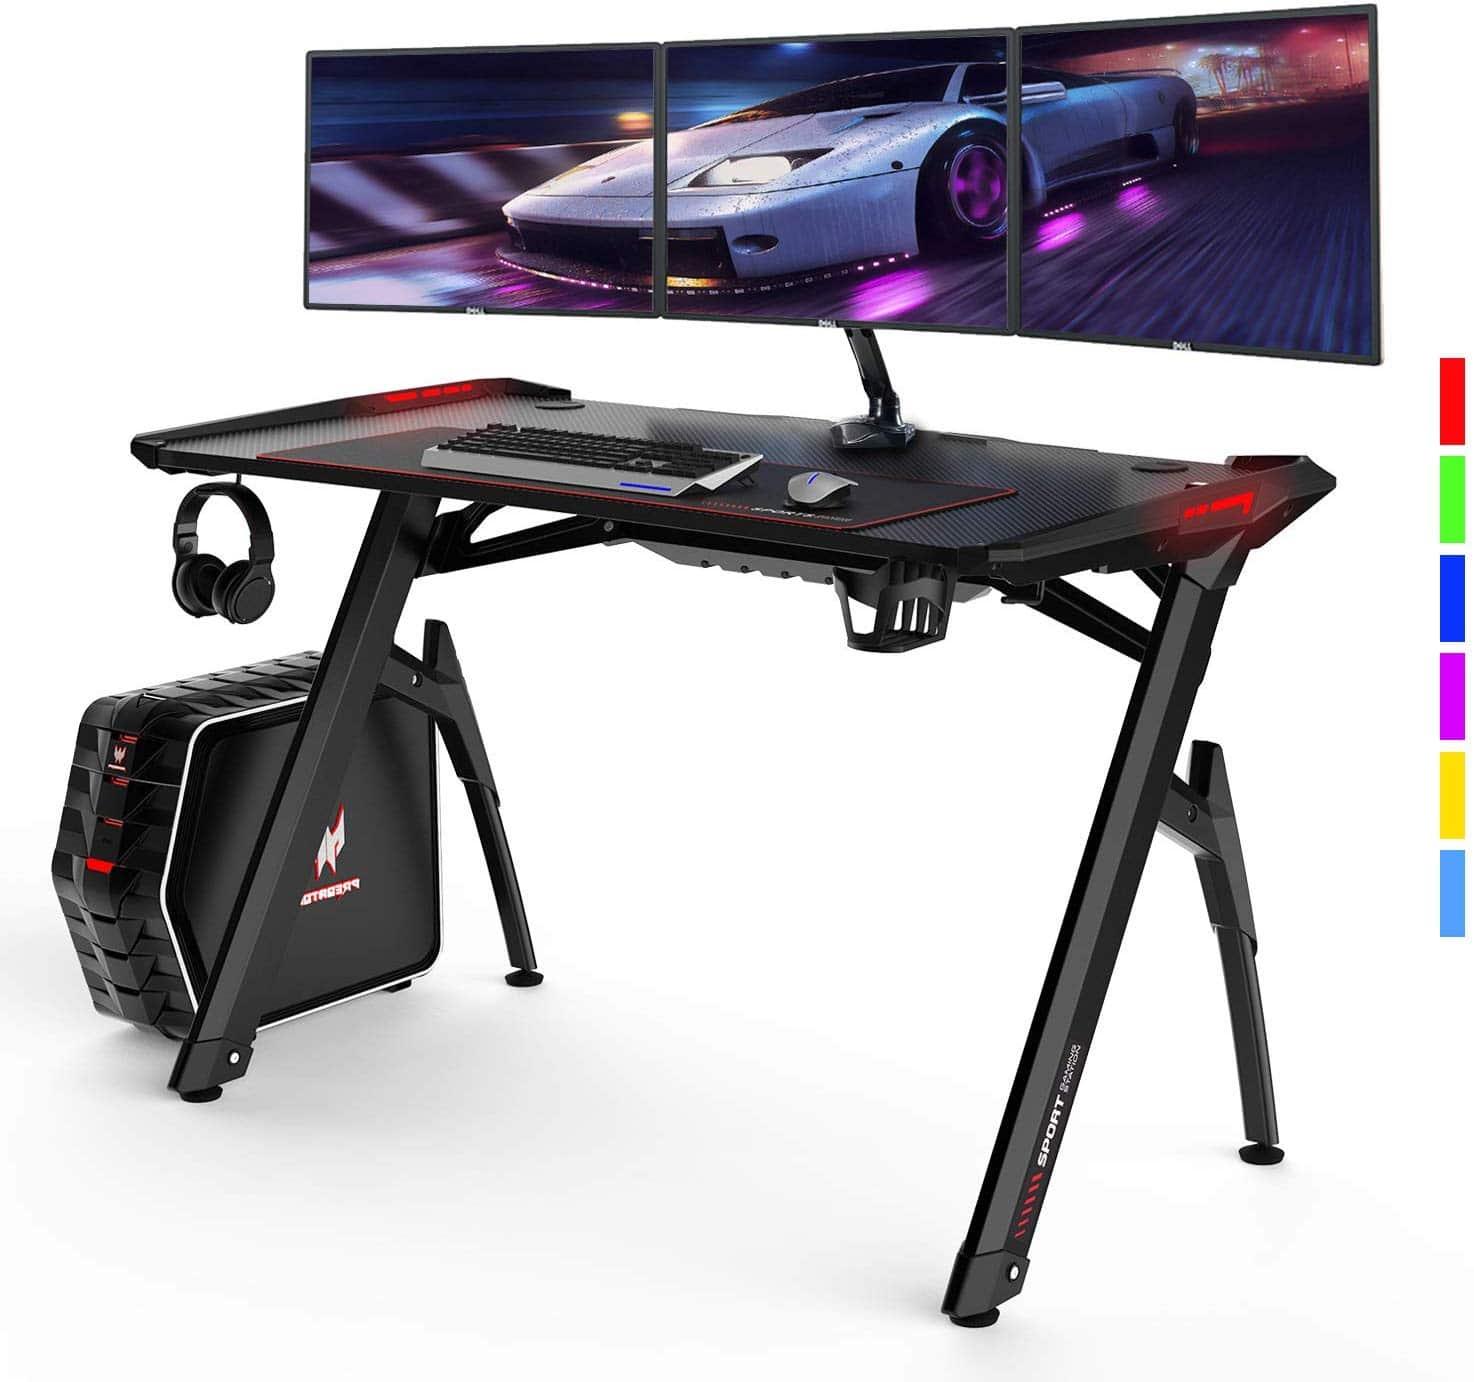 AuAg Gaming Desk